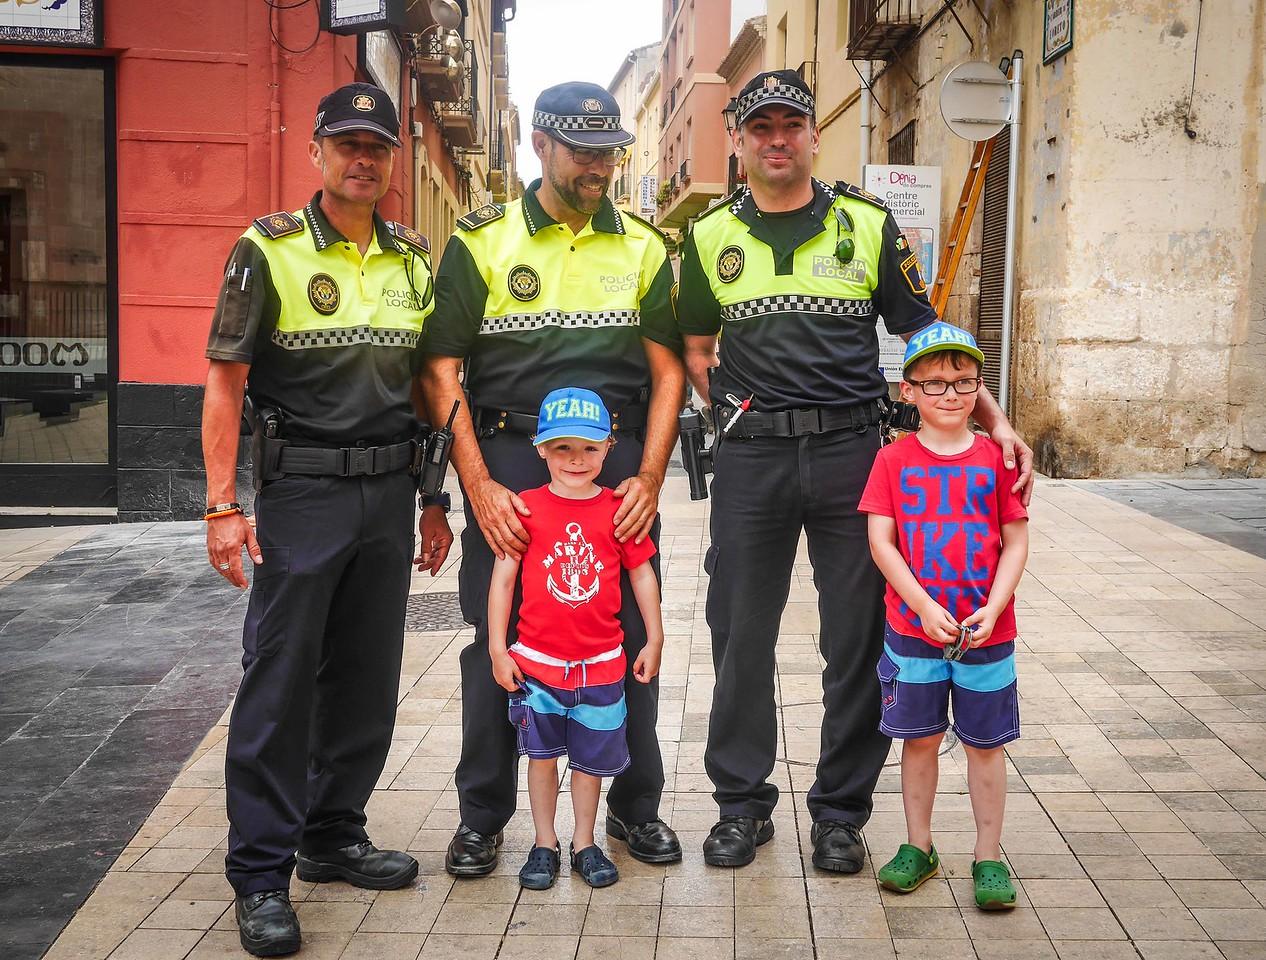 Ethan, Ronan and the Policia, Denia